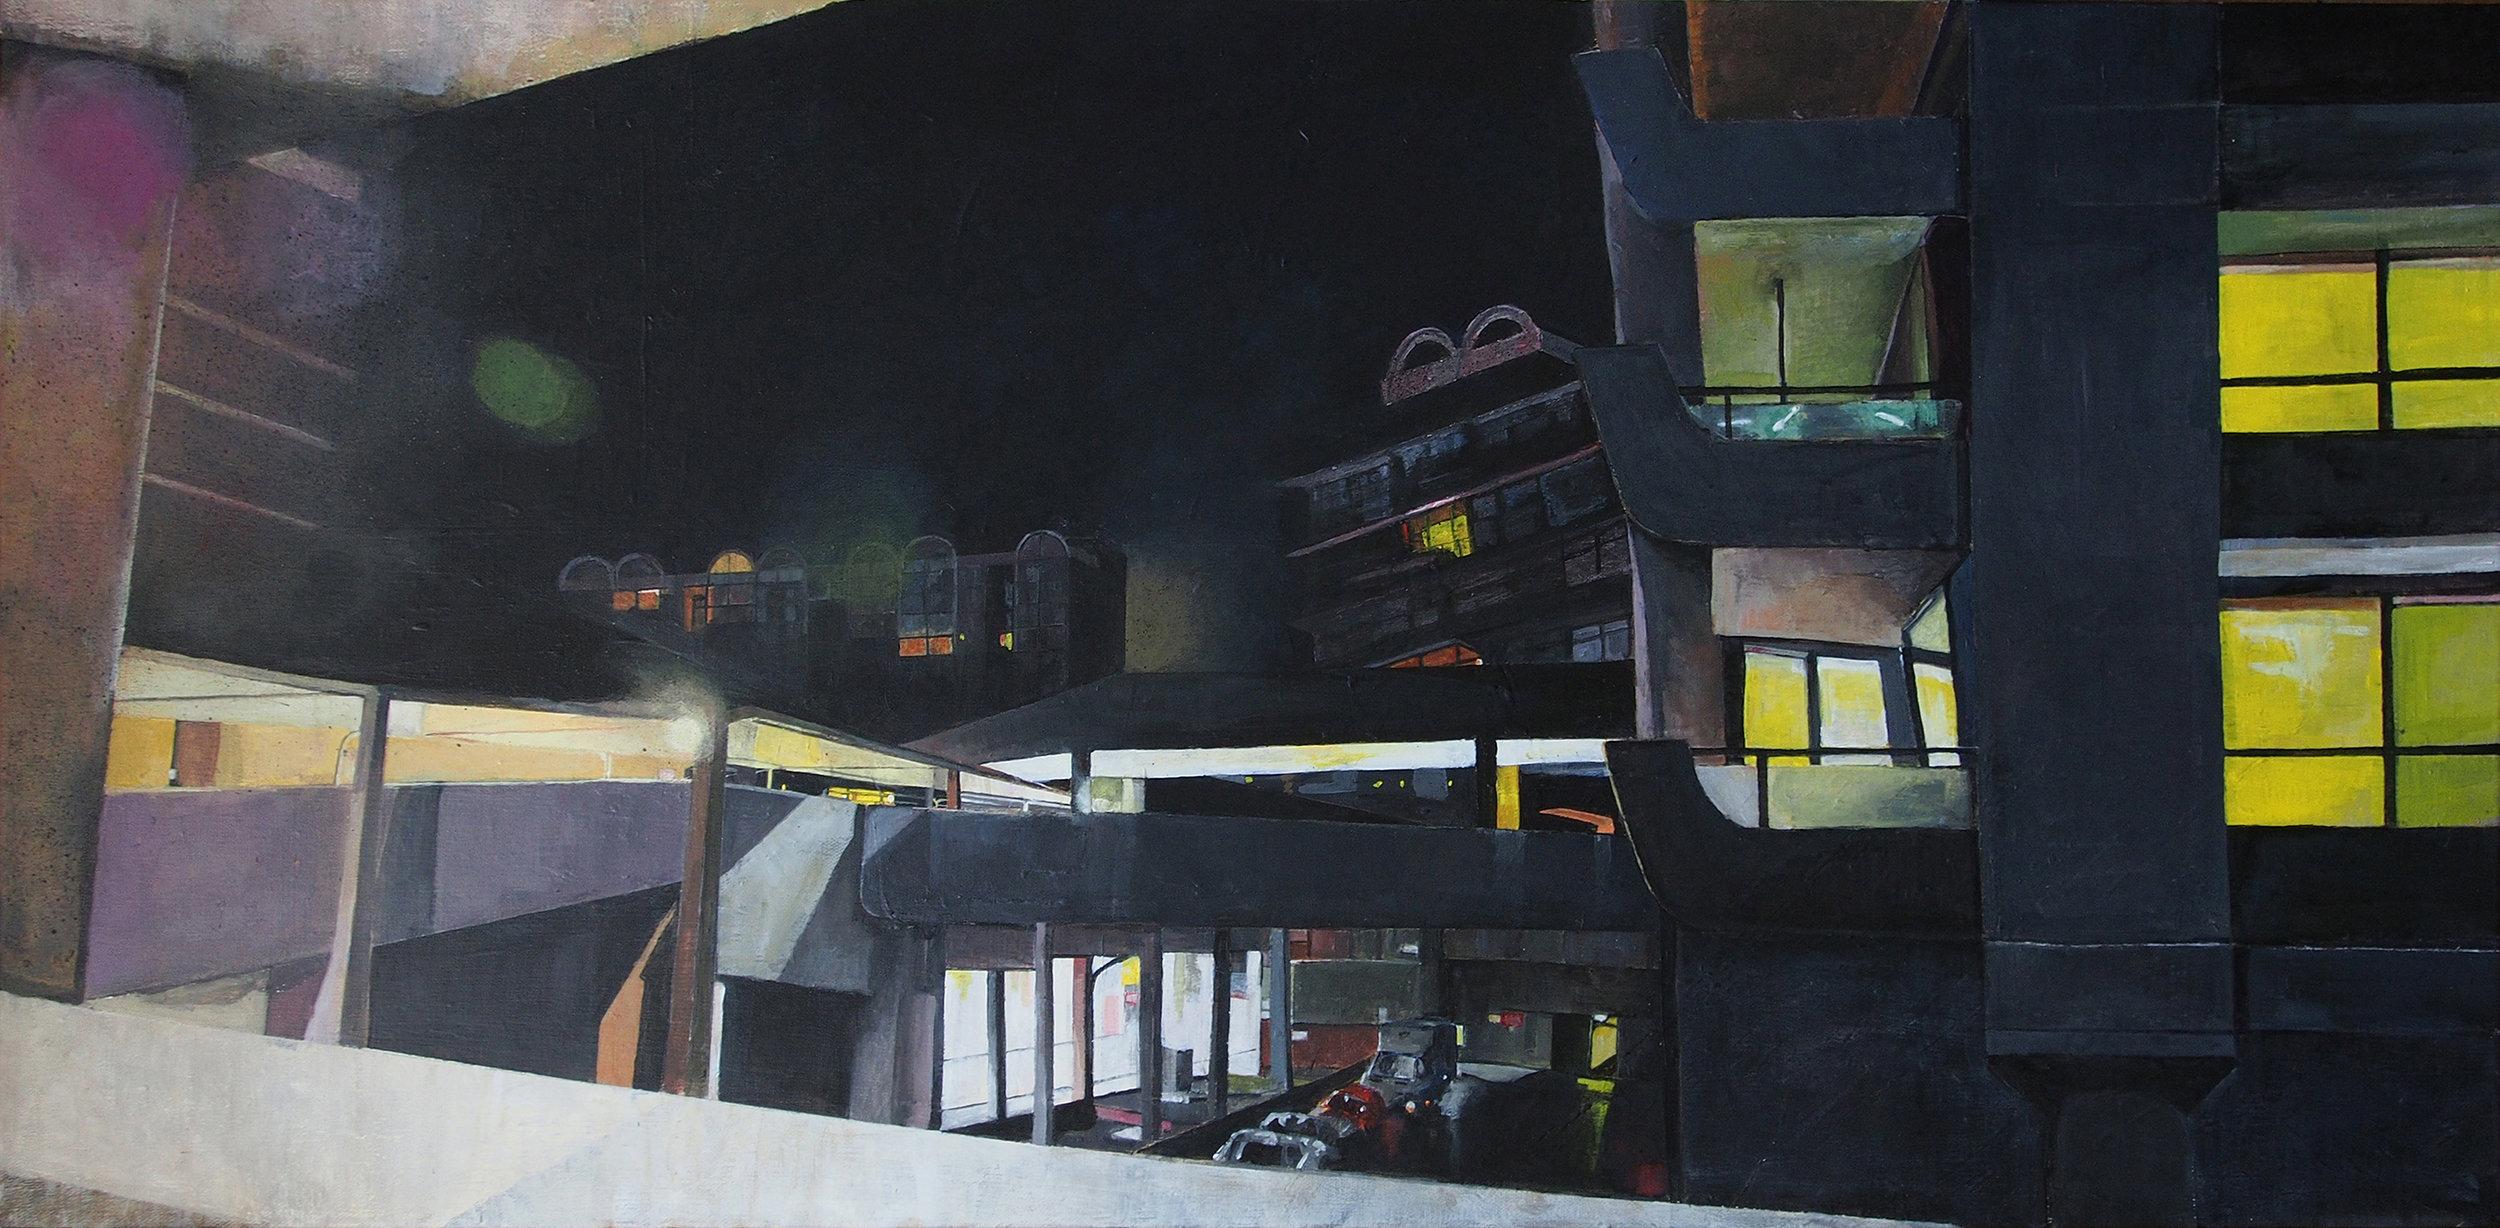 Victoria Dale, Barbican (at night), Acrylic on canvas, 50 cm x 100 cm x 3 cm,  http://www.vickydale.com/